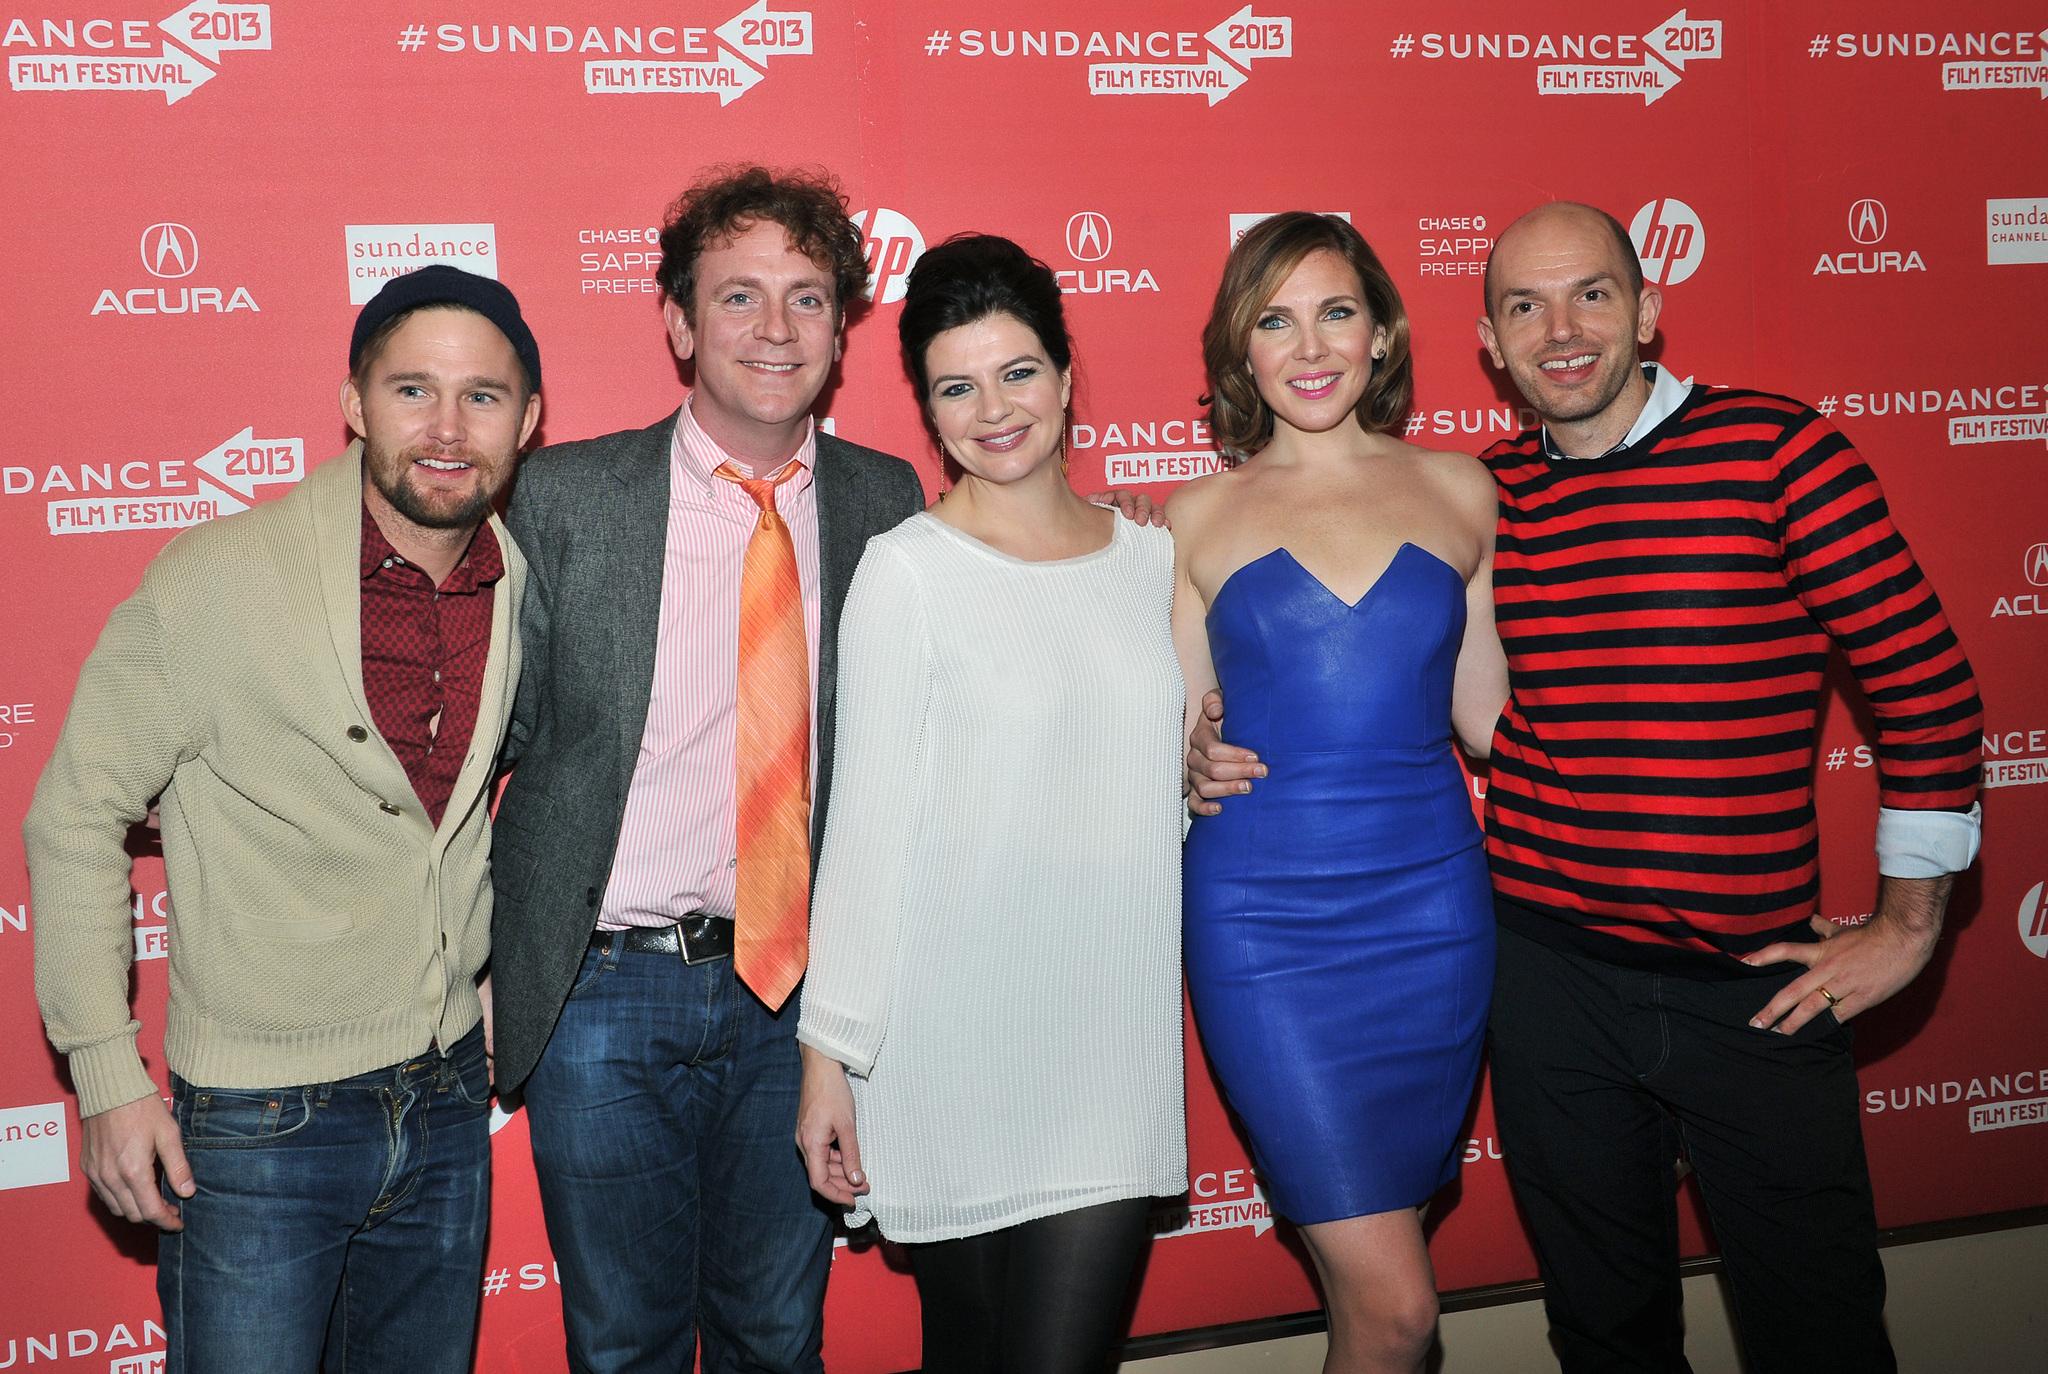 Drew Droege, Paul Scheer, Brian Geraghty, Casey Wilson, and June Diane Raphael at an event for Ass Backwards (2013)